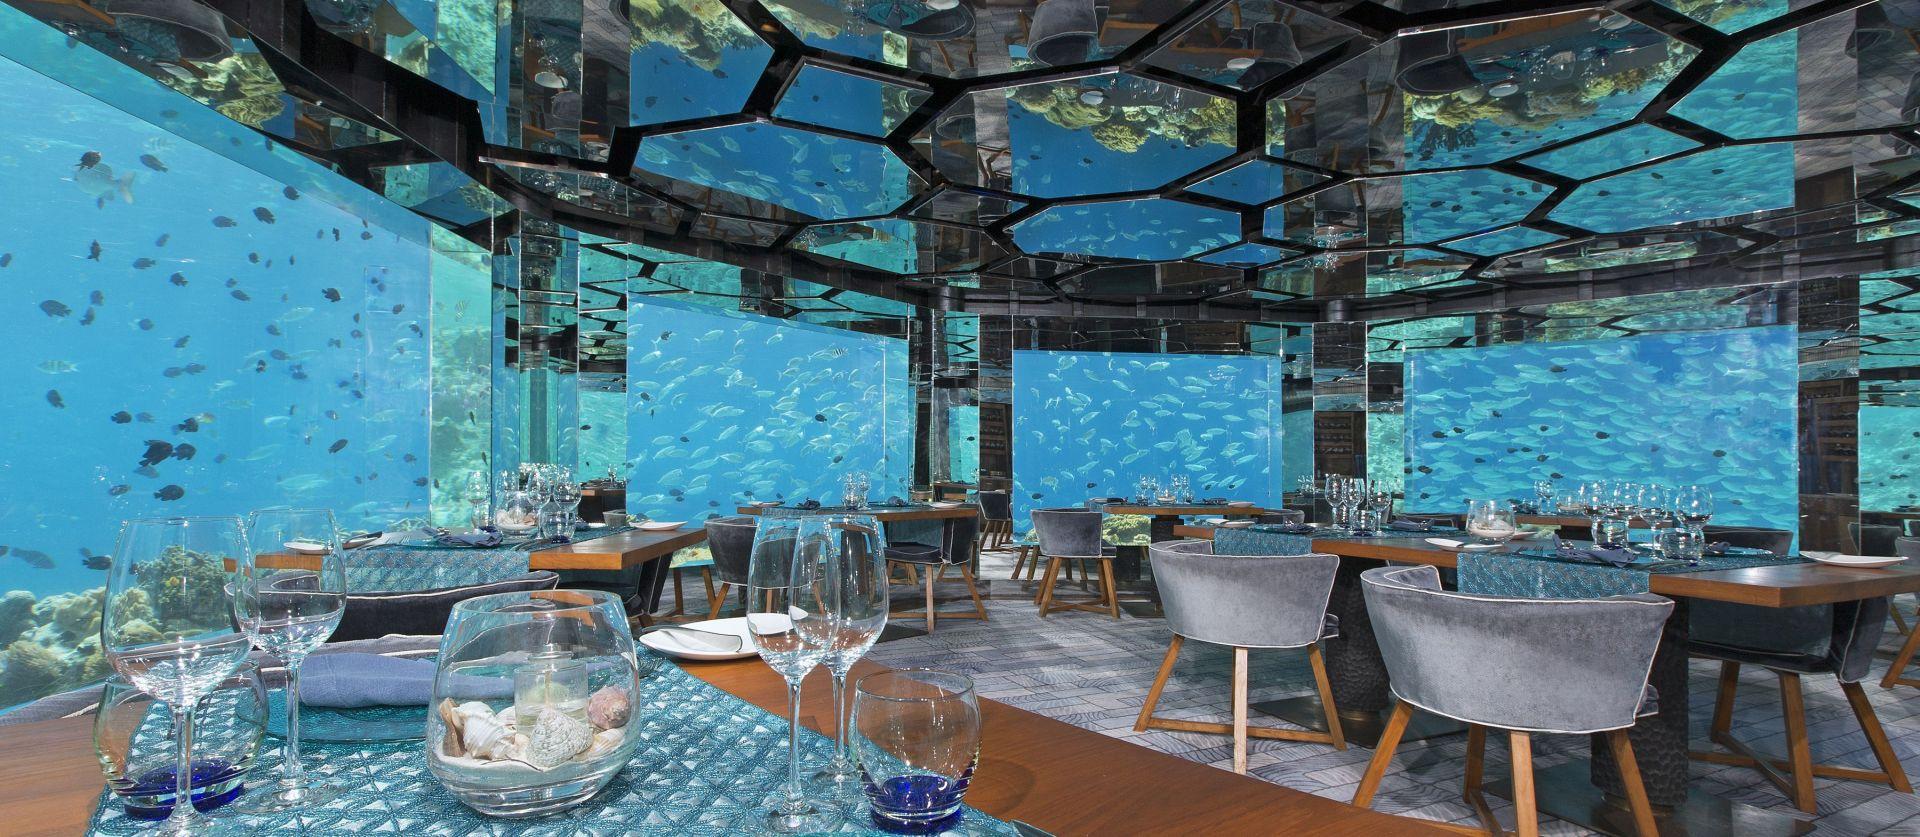 restaurante-abaixo-dagua-ilhas-maldivas